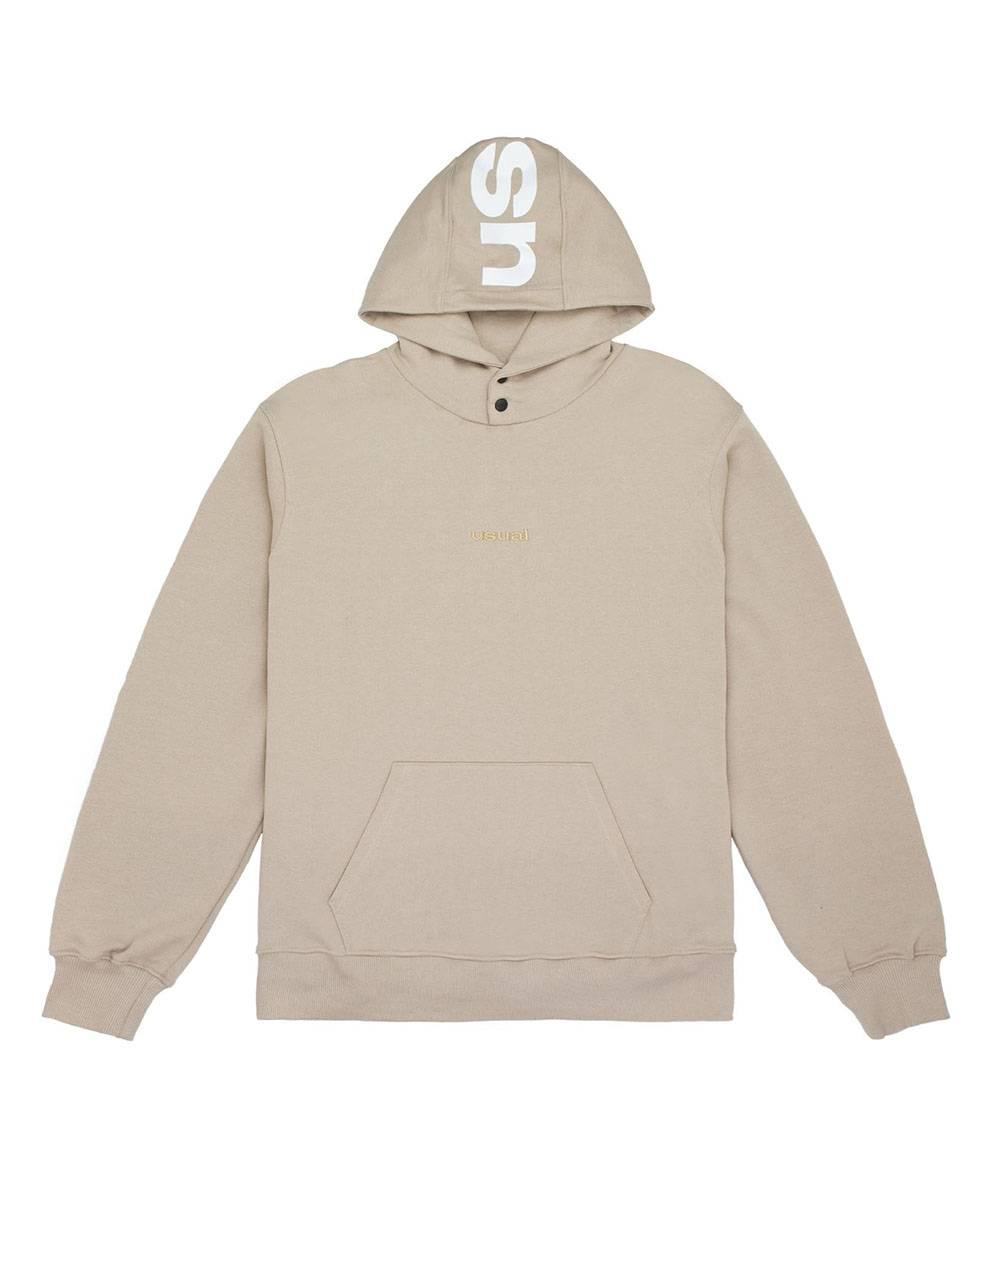 Usual Clip Hooded Sweatshirt - cream Usual Sweater 120,00€